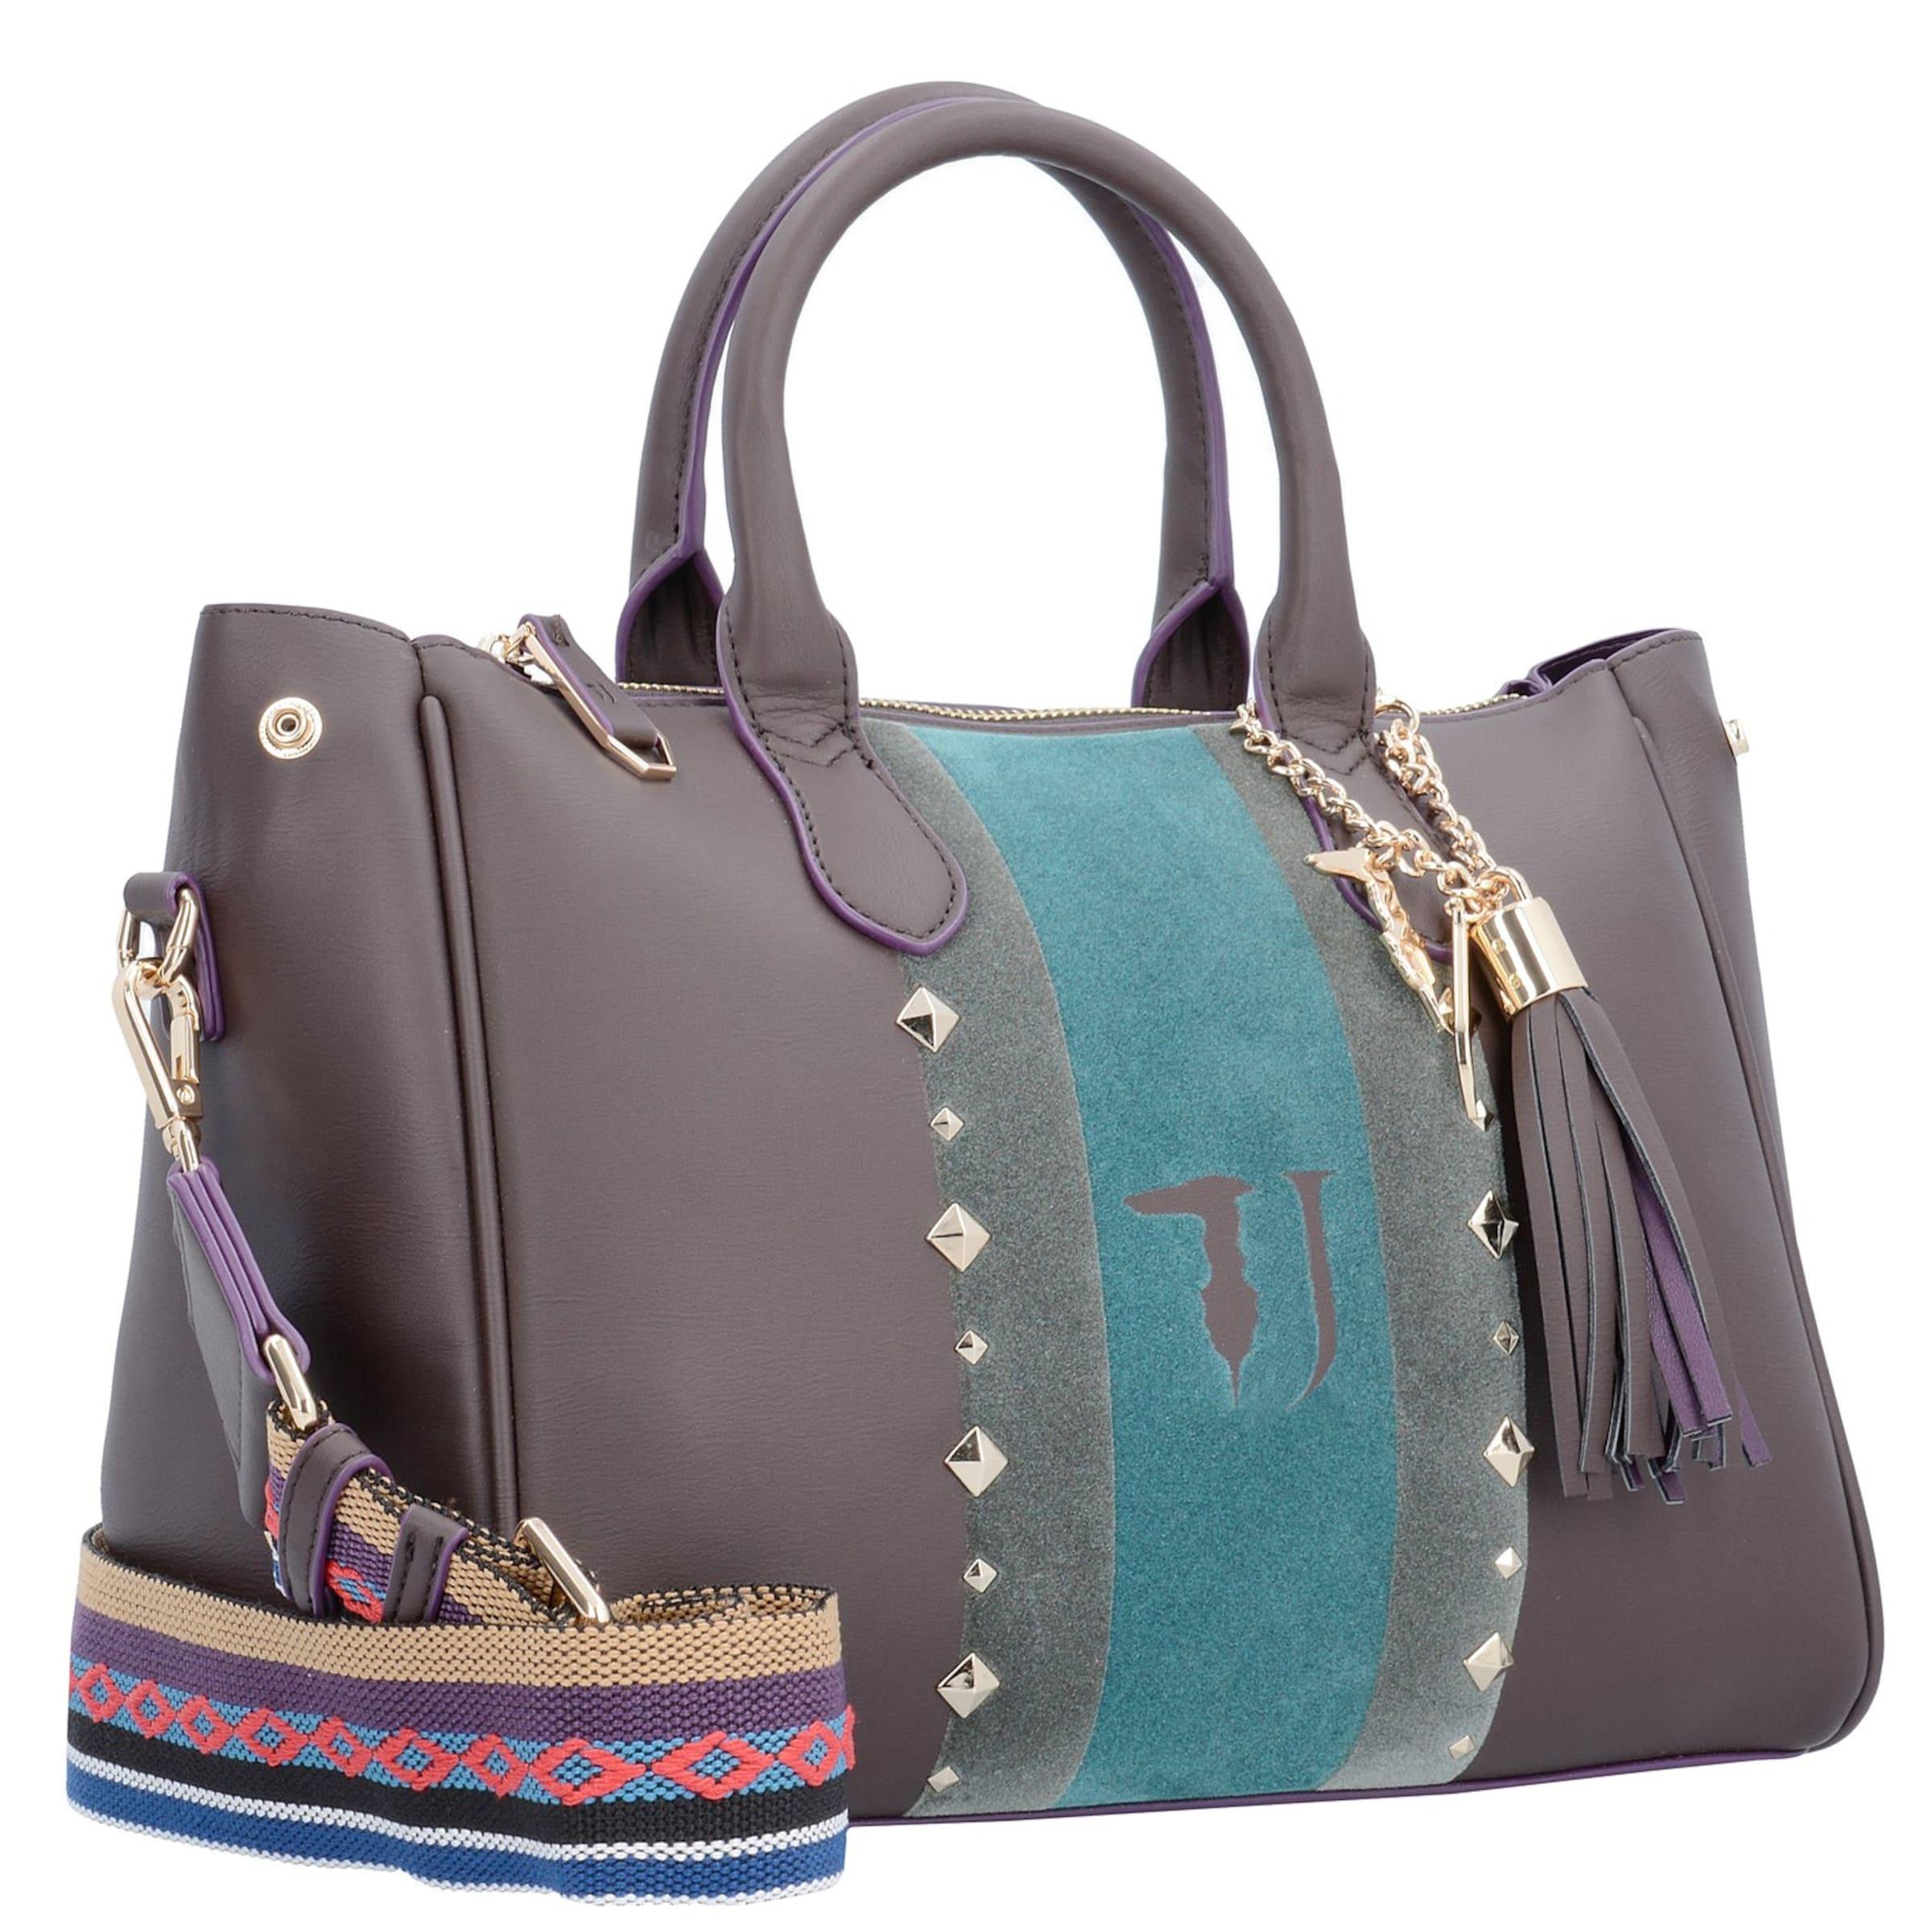 Trussardi Jeans Blondie Ecoleather Stud Tote Medium Bag Handtasche 30 cm Rabatt Offiziell sujHV